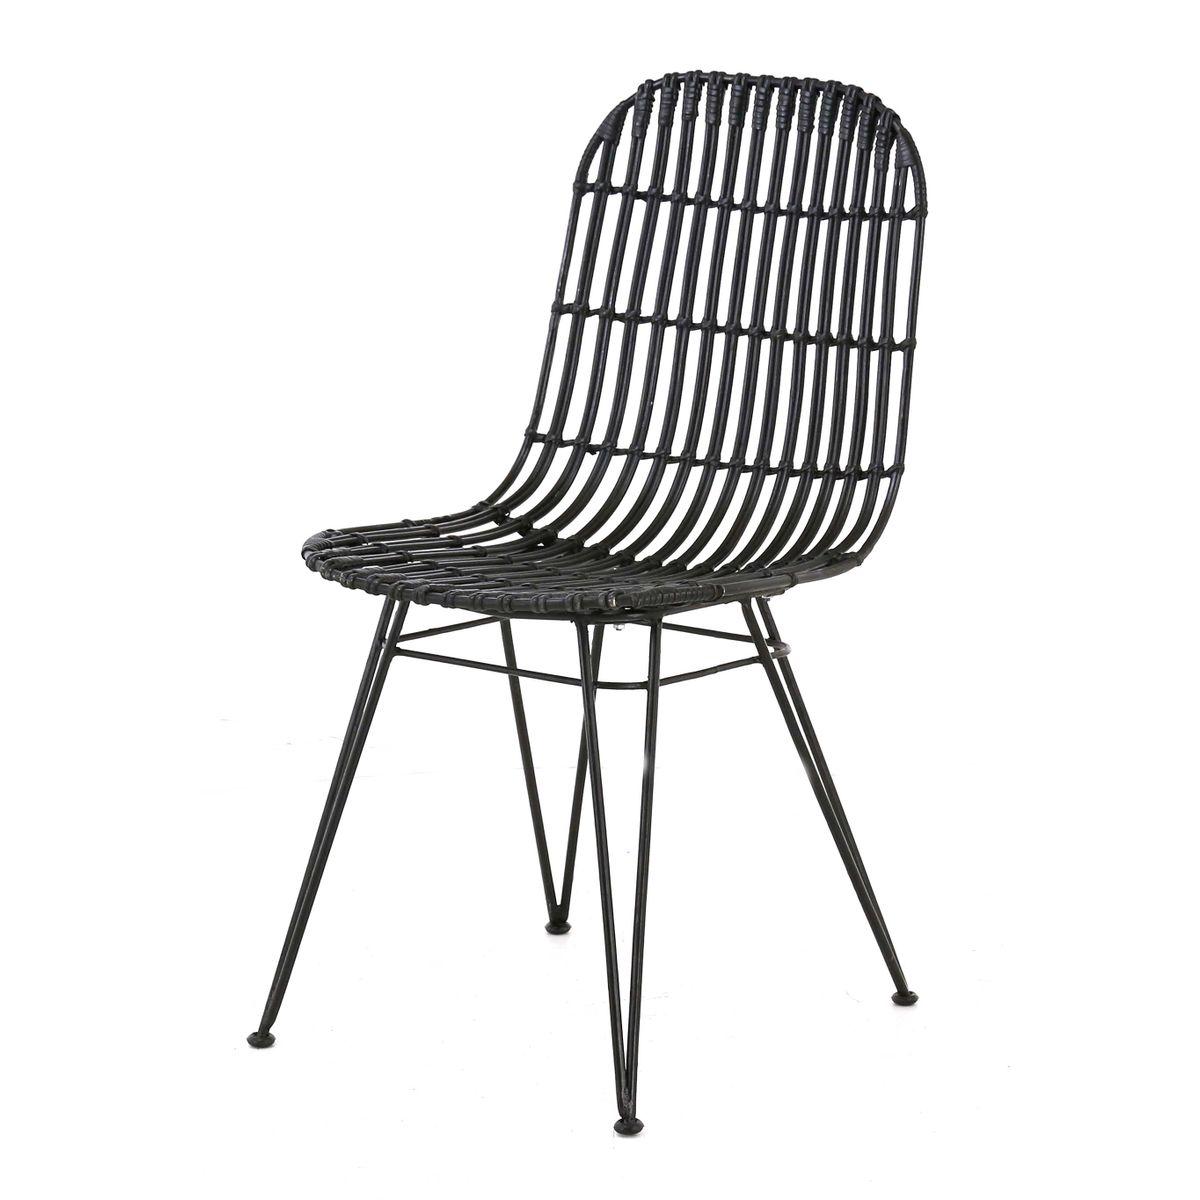 Chaise rotin et métal  noir